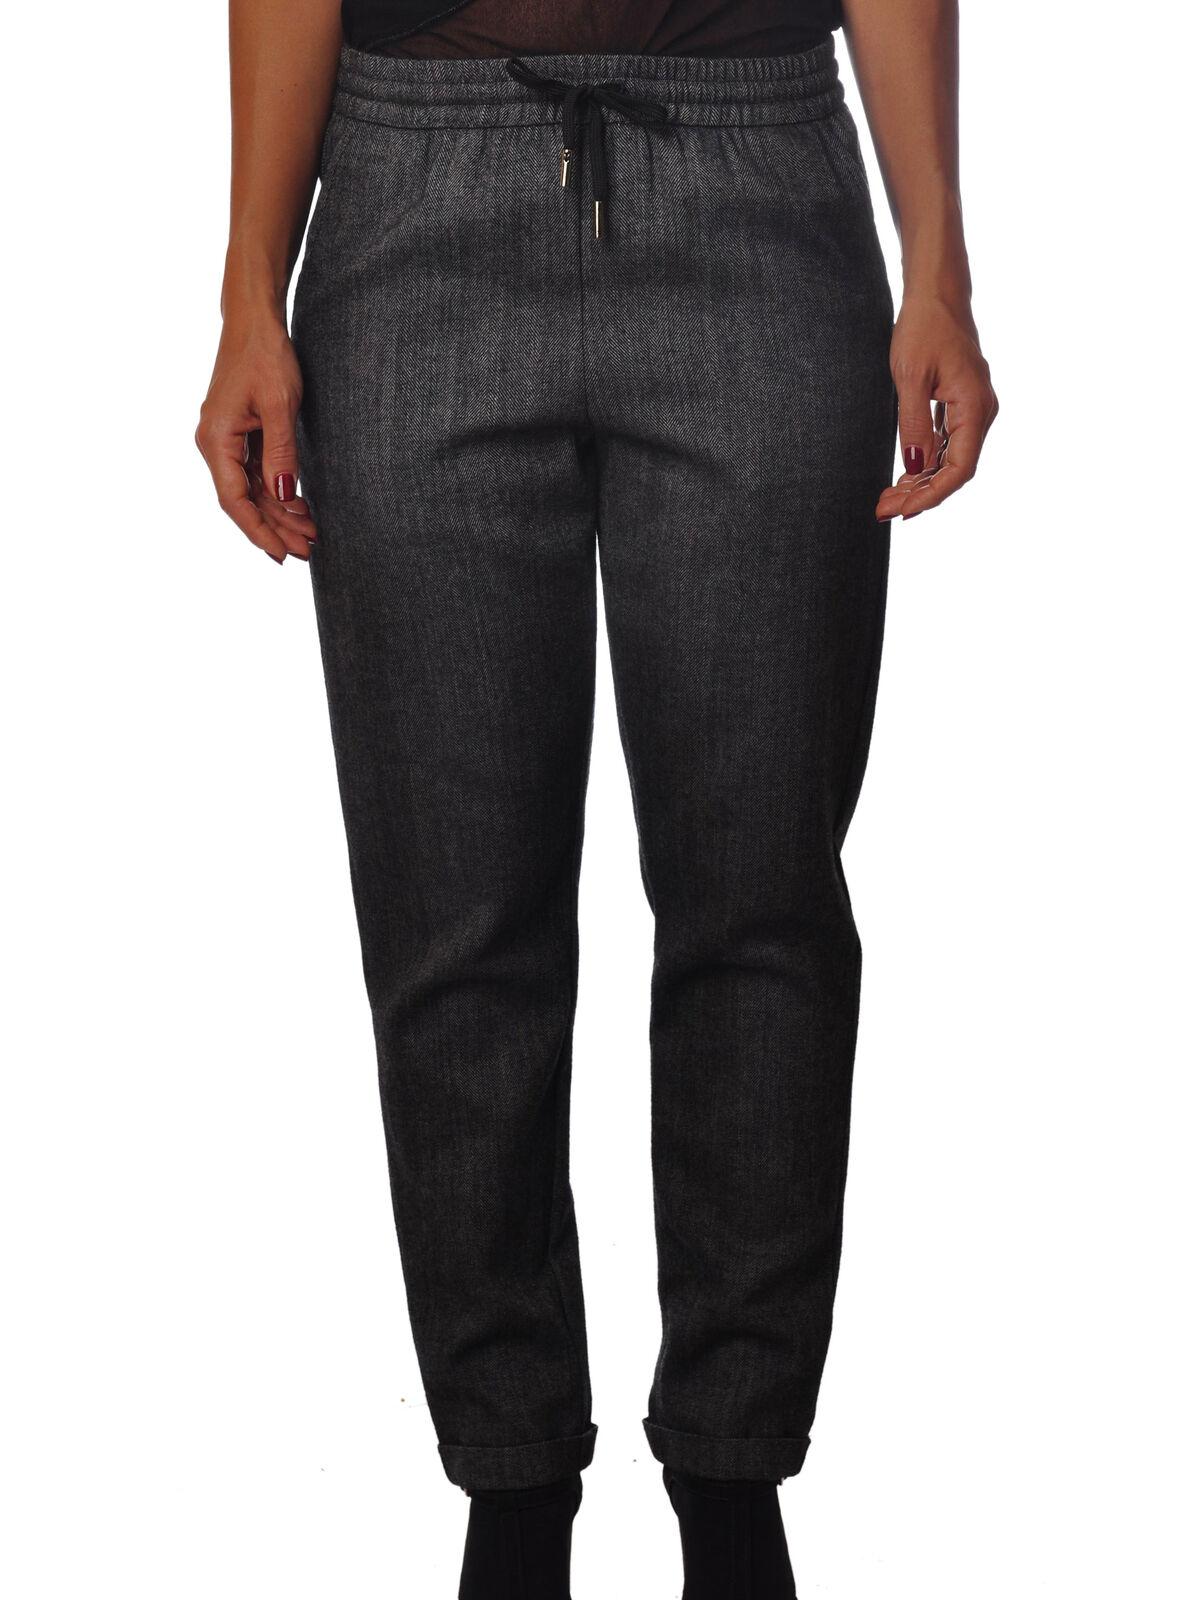 Woolrich  -  Pants - Female - Grey - 3989131A184903